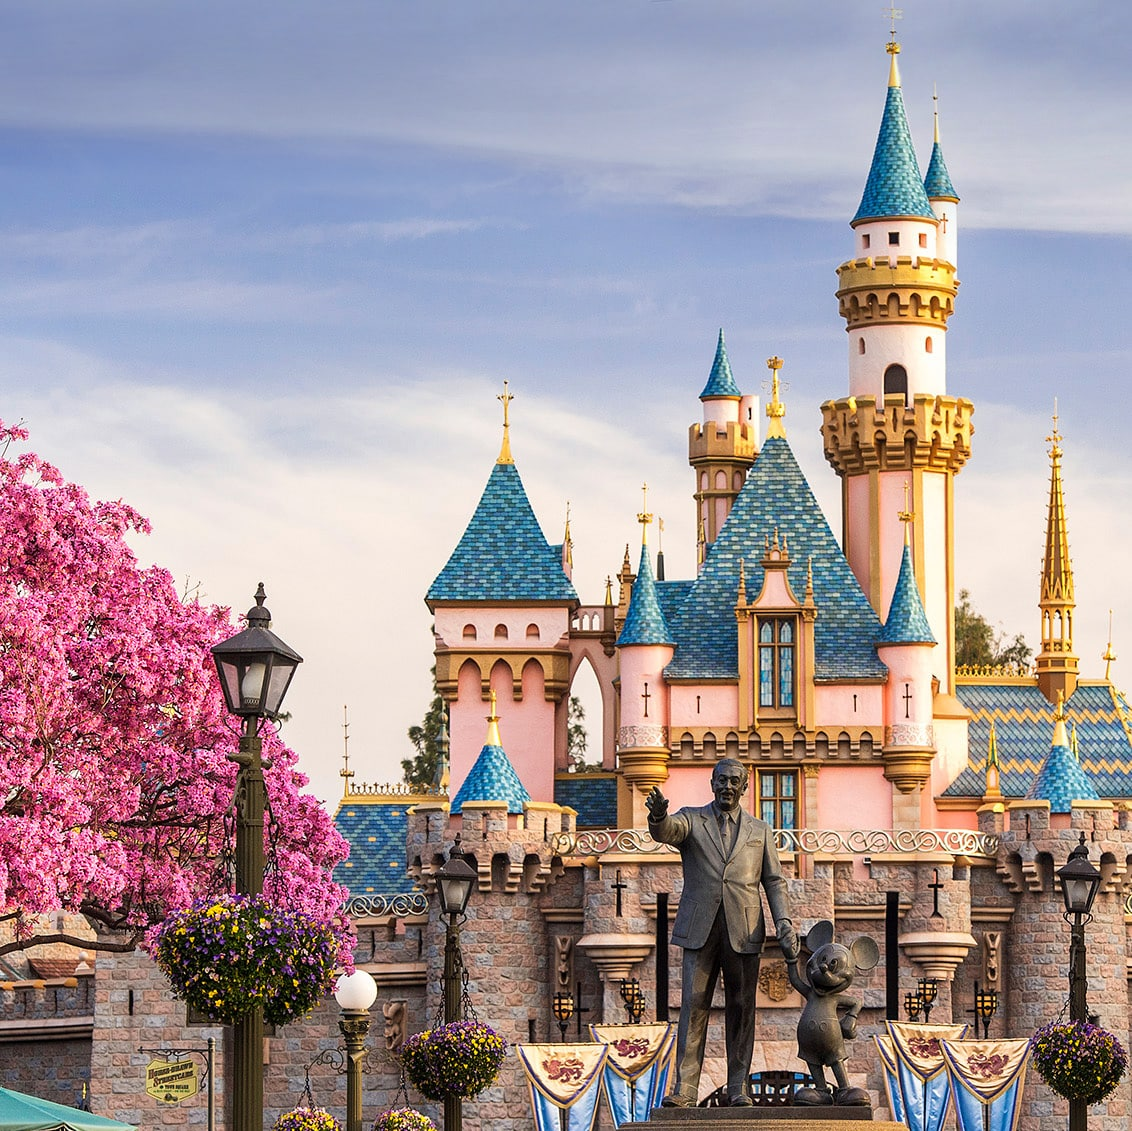 Disneyland's Sleeping Beauty's Castle in Spring